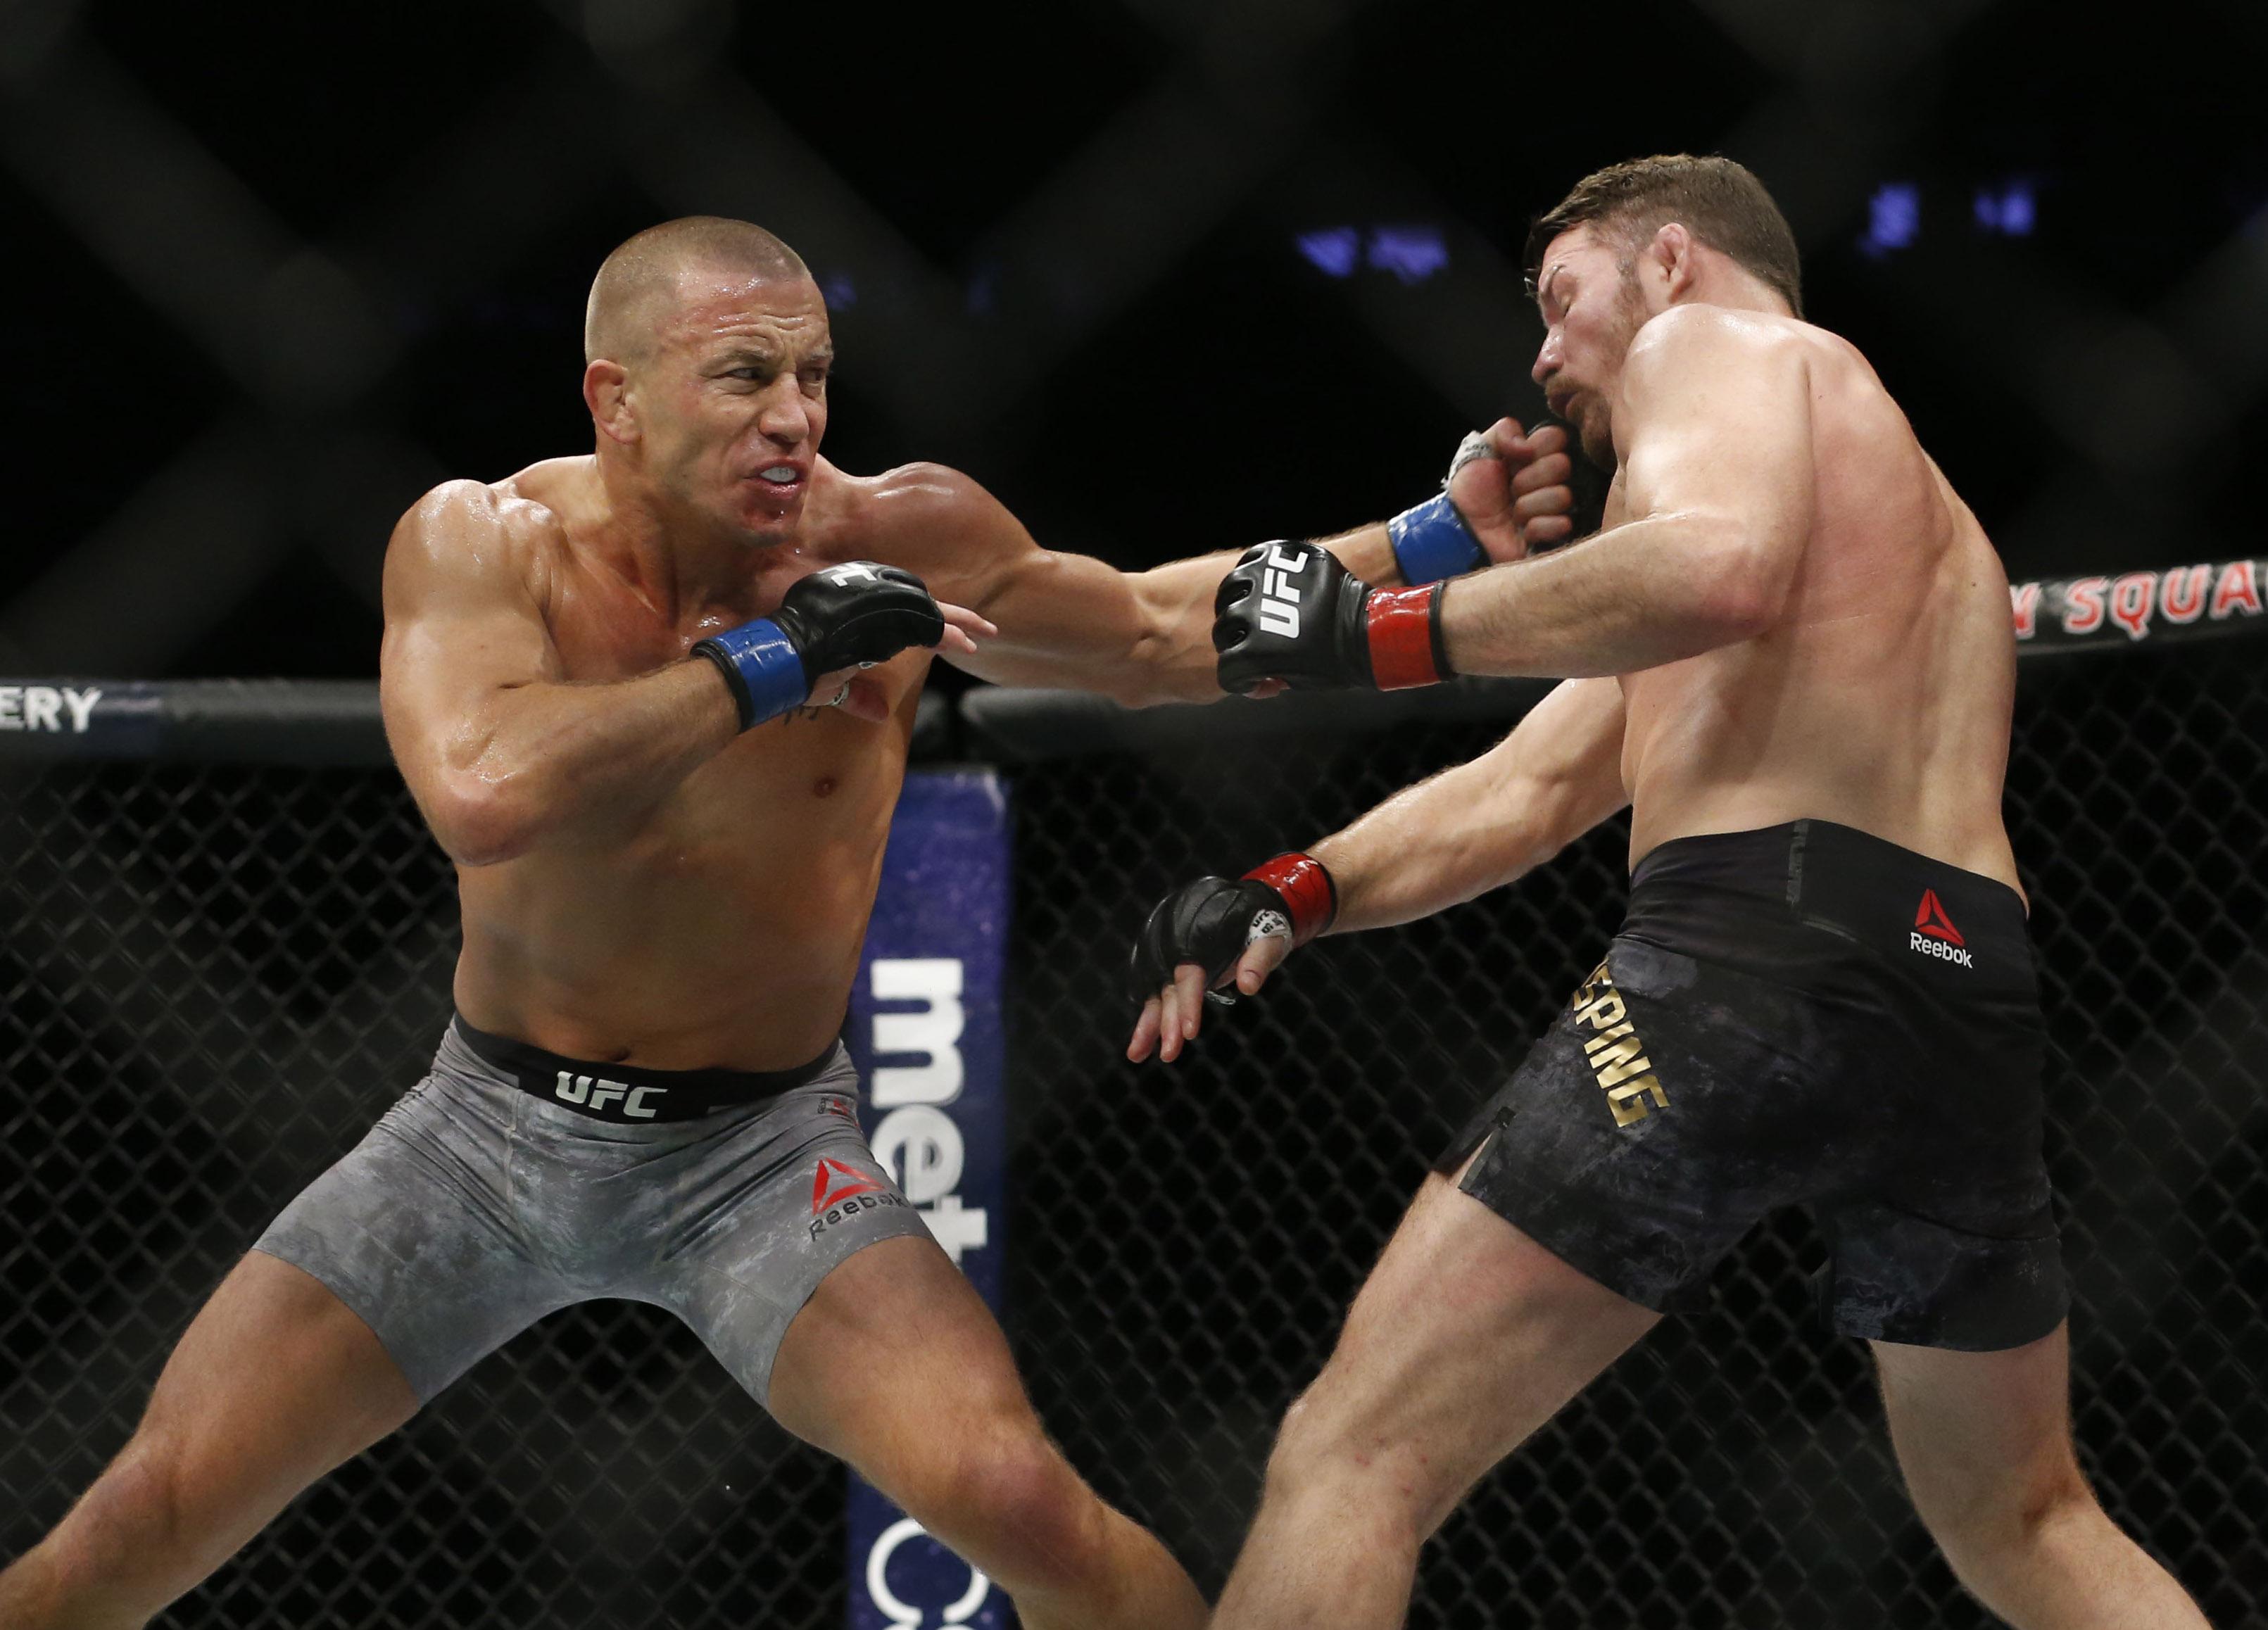 MMA: UFC 217-Bisping vs St-Pierre